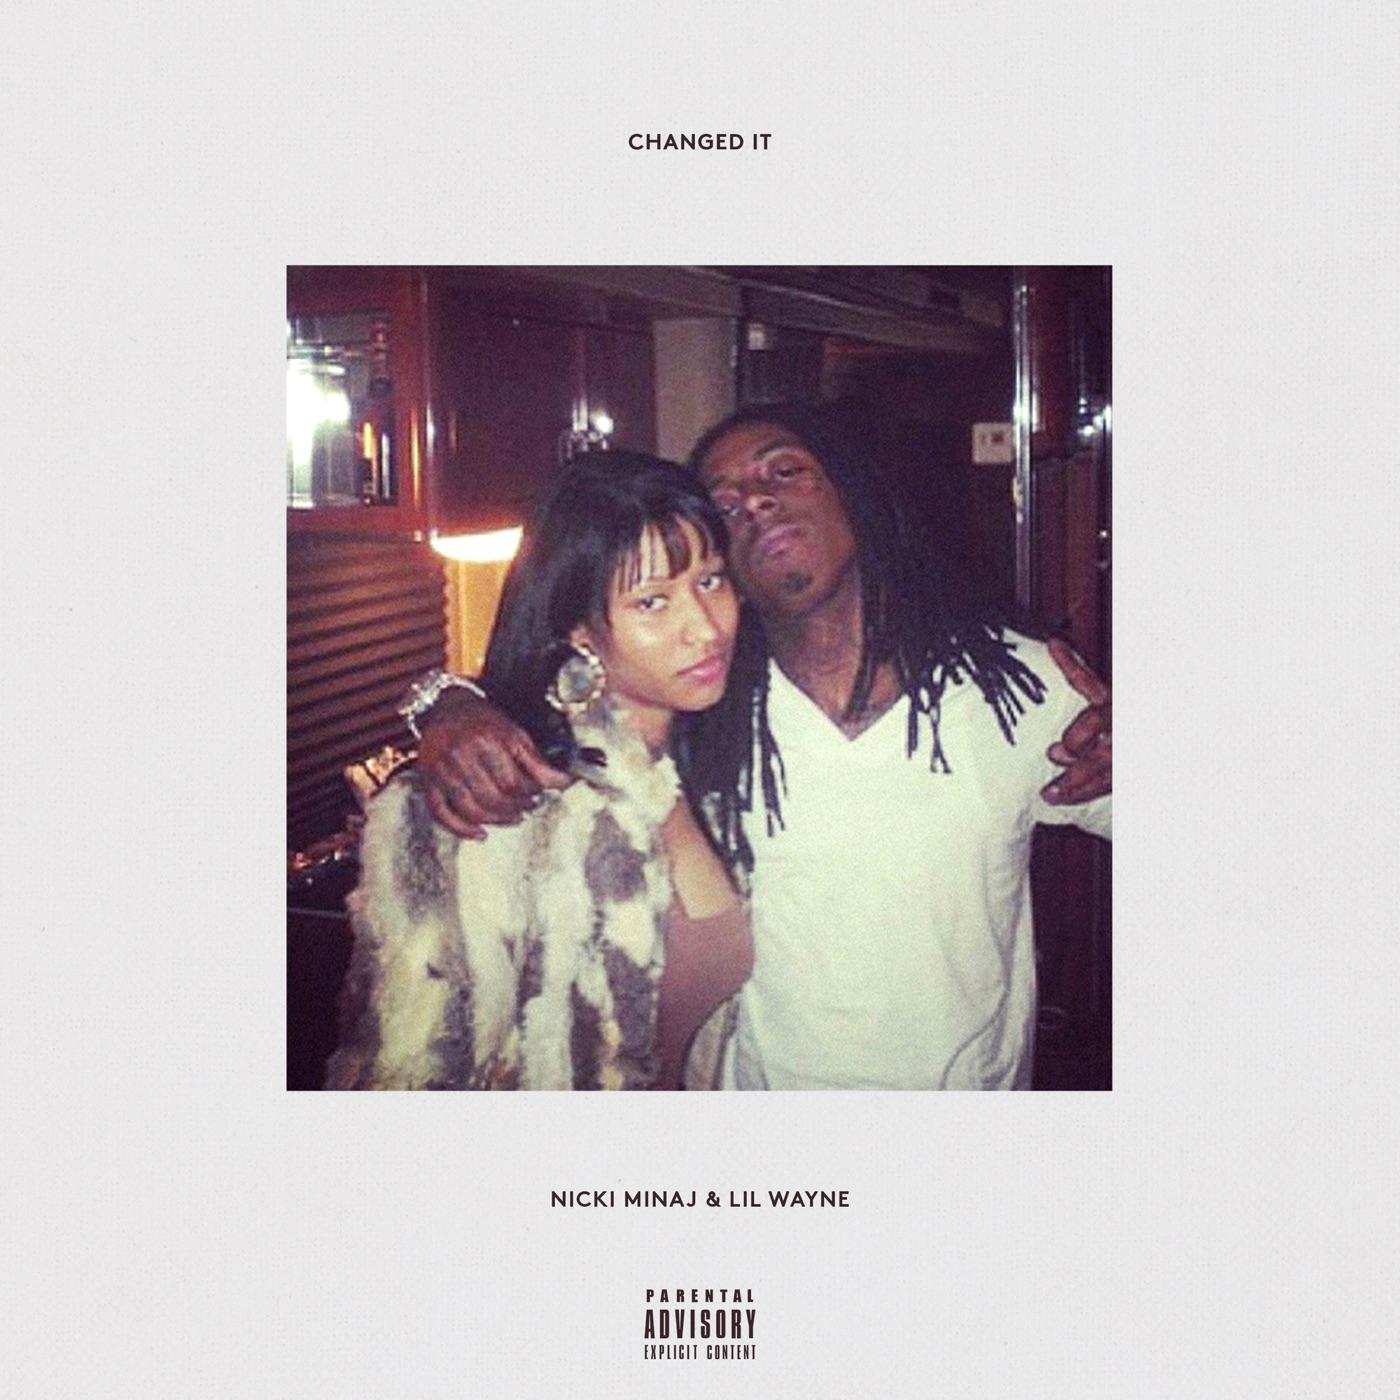 Nicki Minaj & Lil Wayne - Changed It - Single